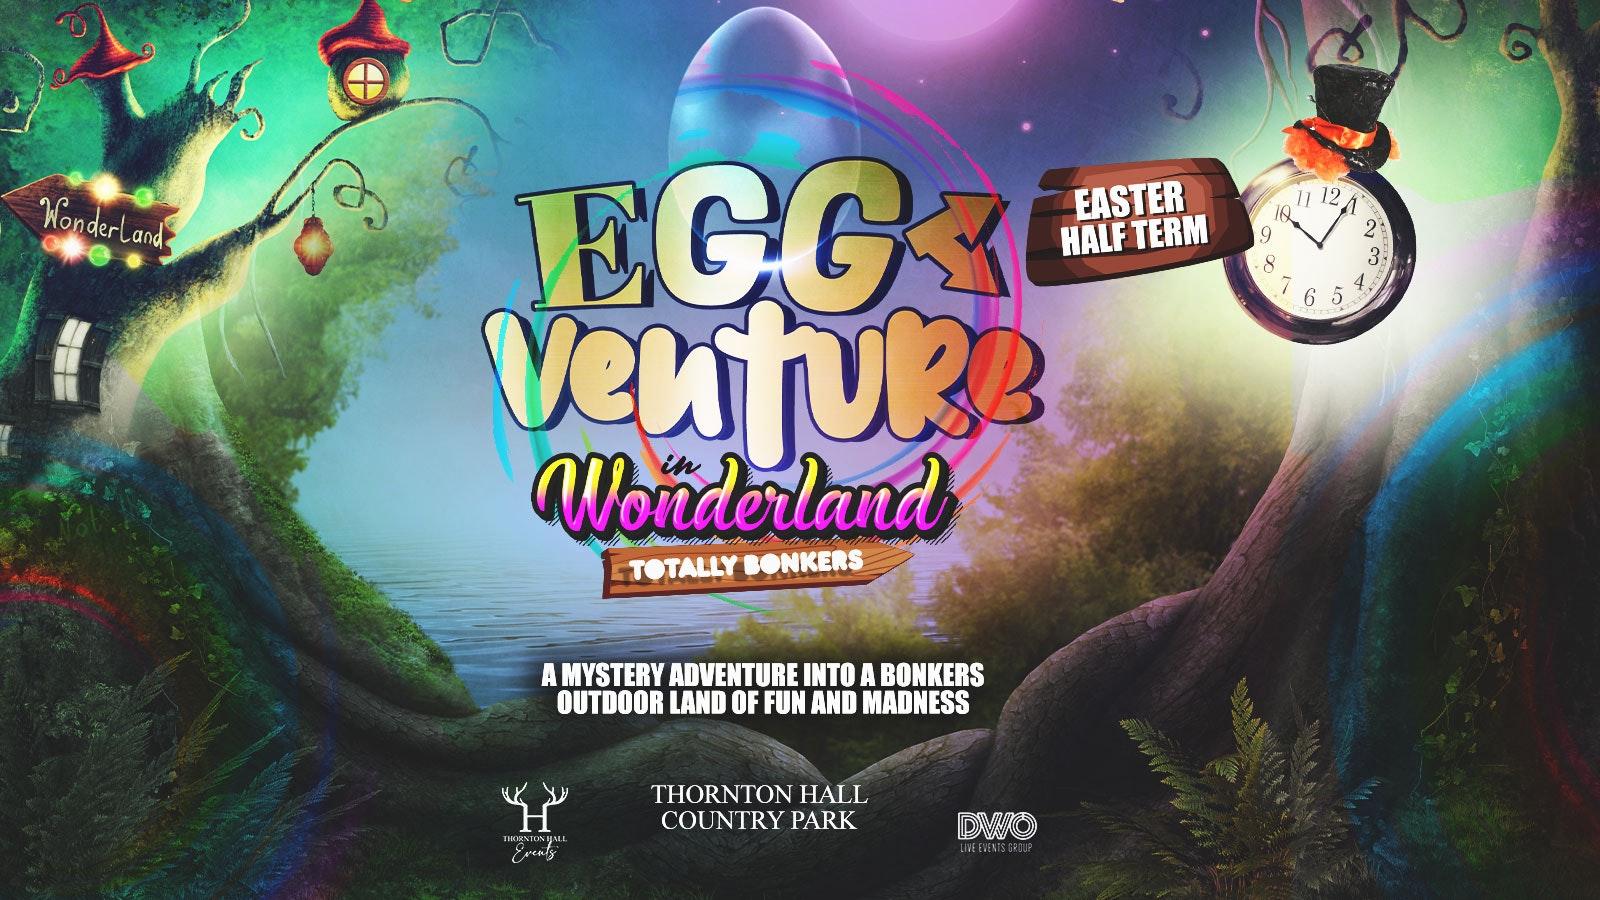 EggVenture in Wonderland – Tuesday 30th March – 10.30am